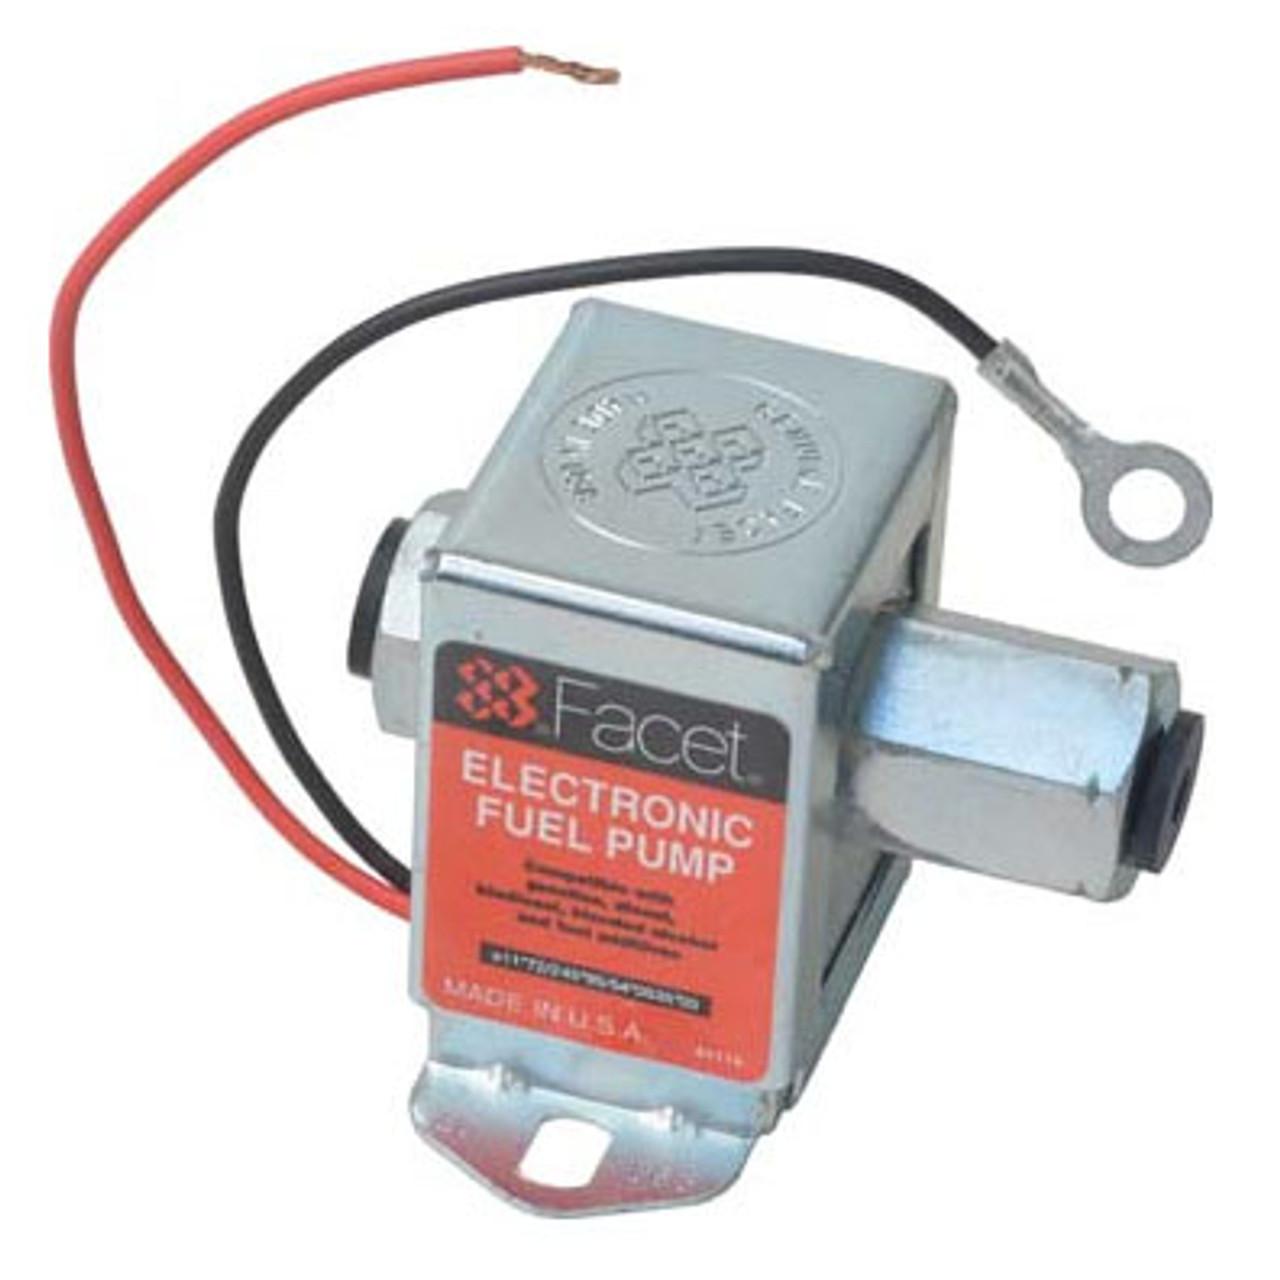 40163 Facet Cube Solid State Fuel Pump, 12 Volt, 1.5-2.5 PSI, 17 GPH